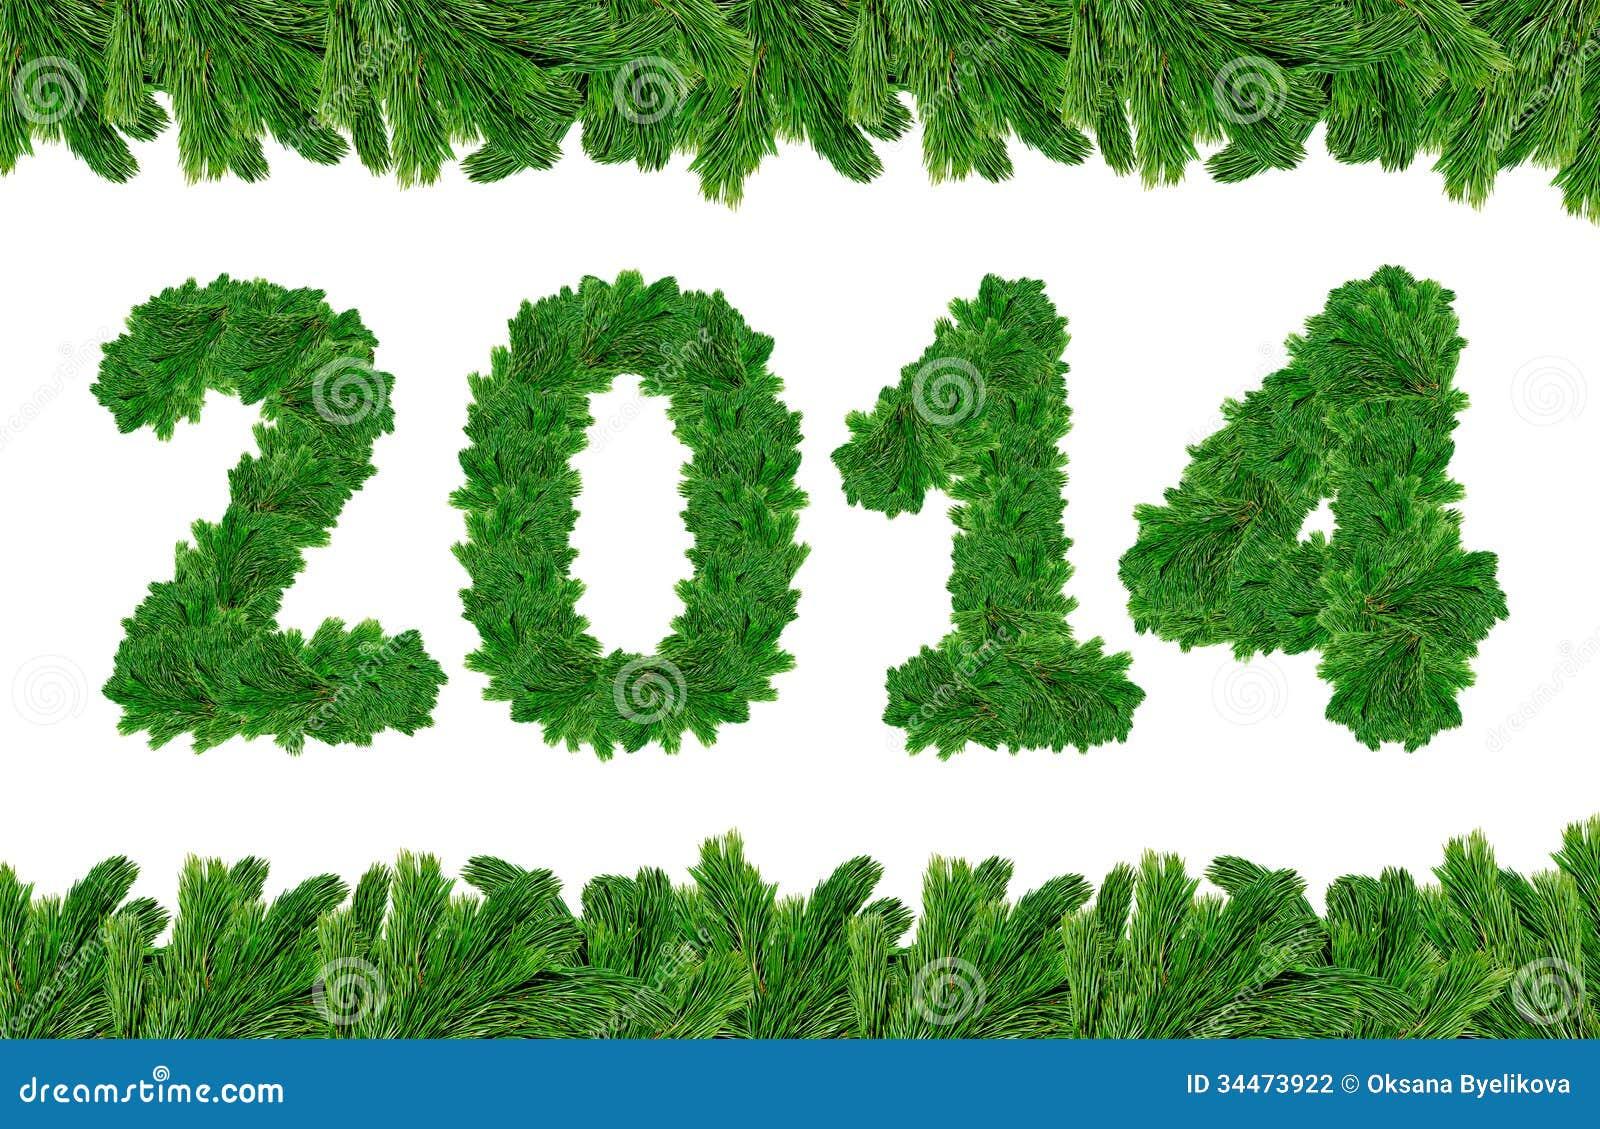 2014, Christmas Tree Font Stock Photography - Image: 34473922